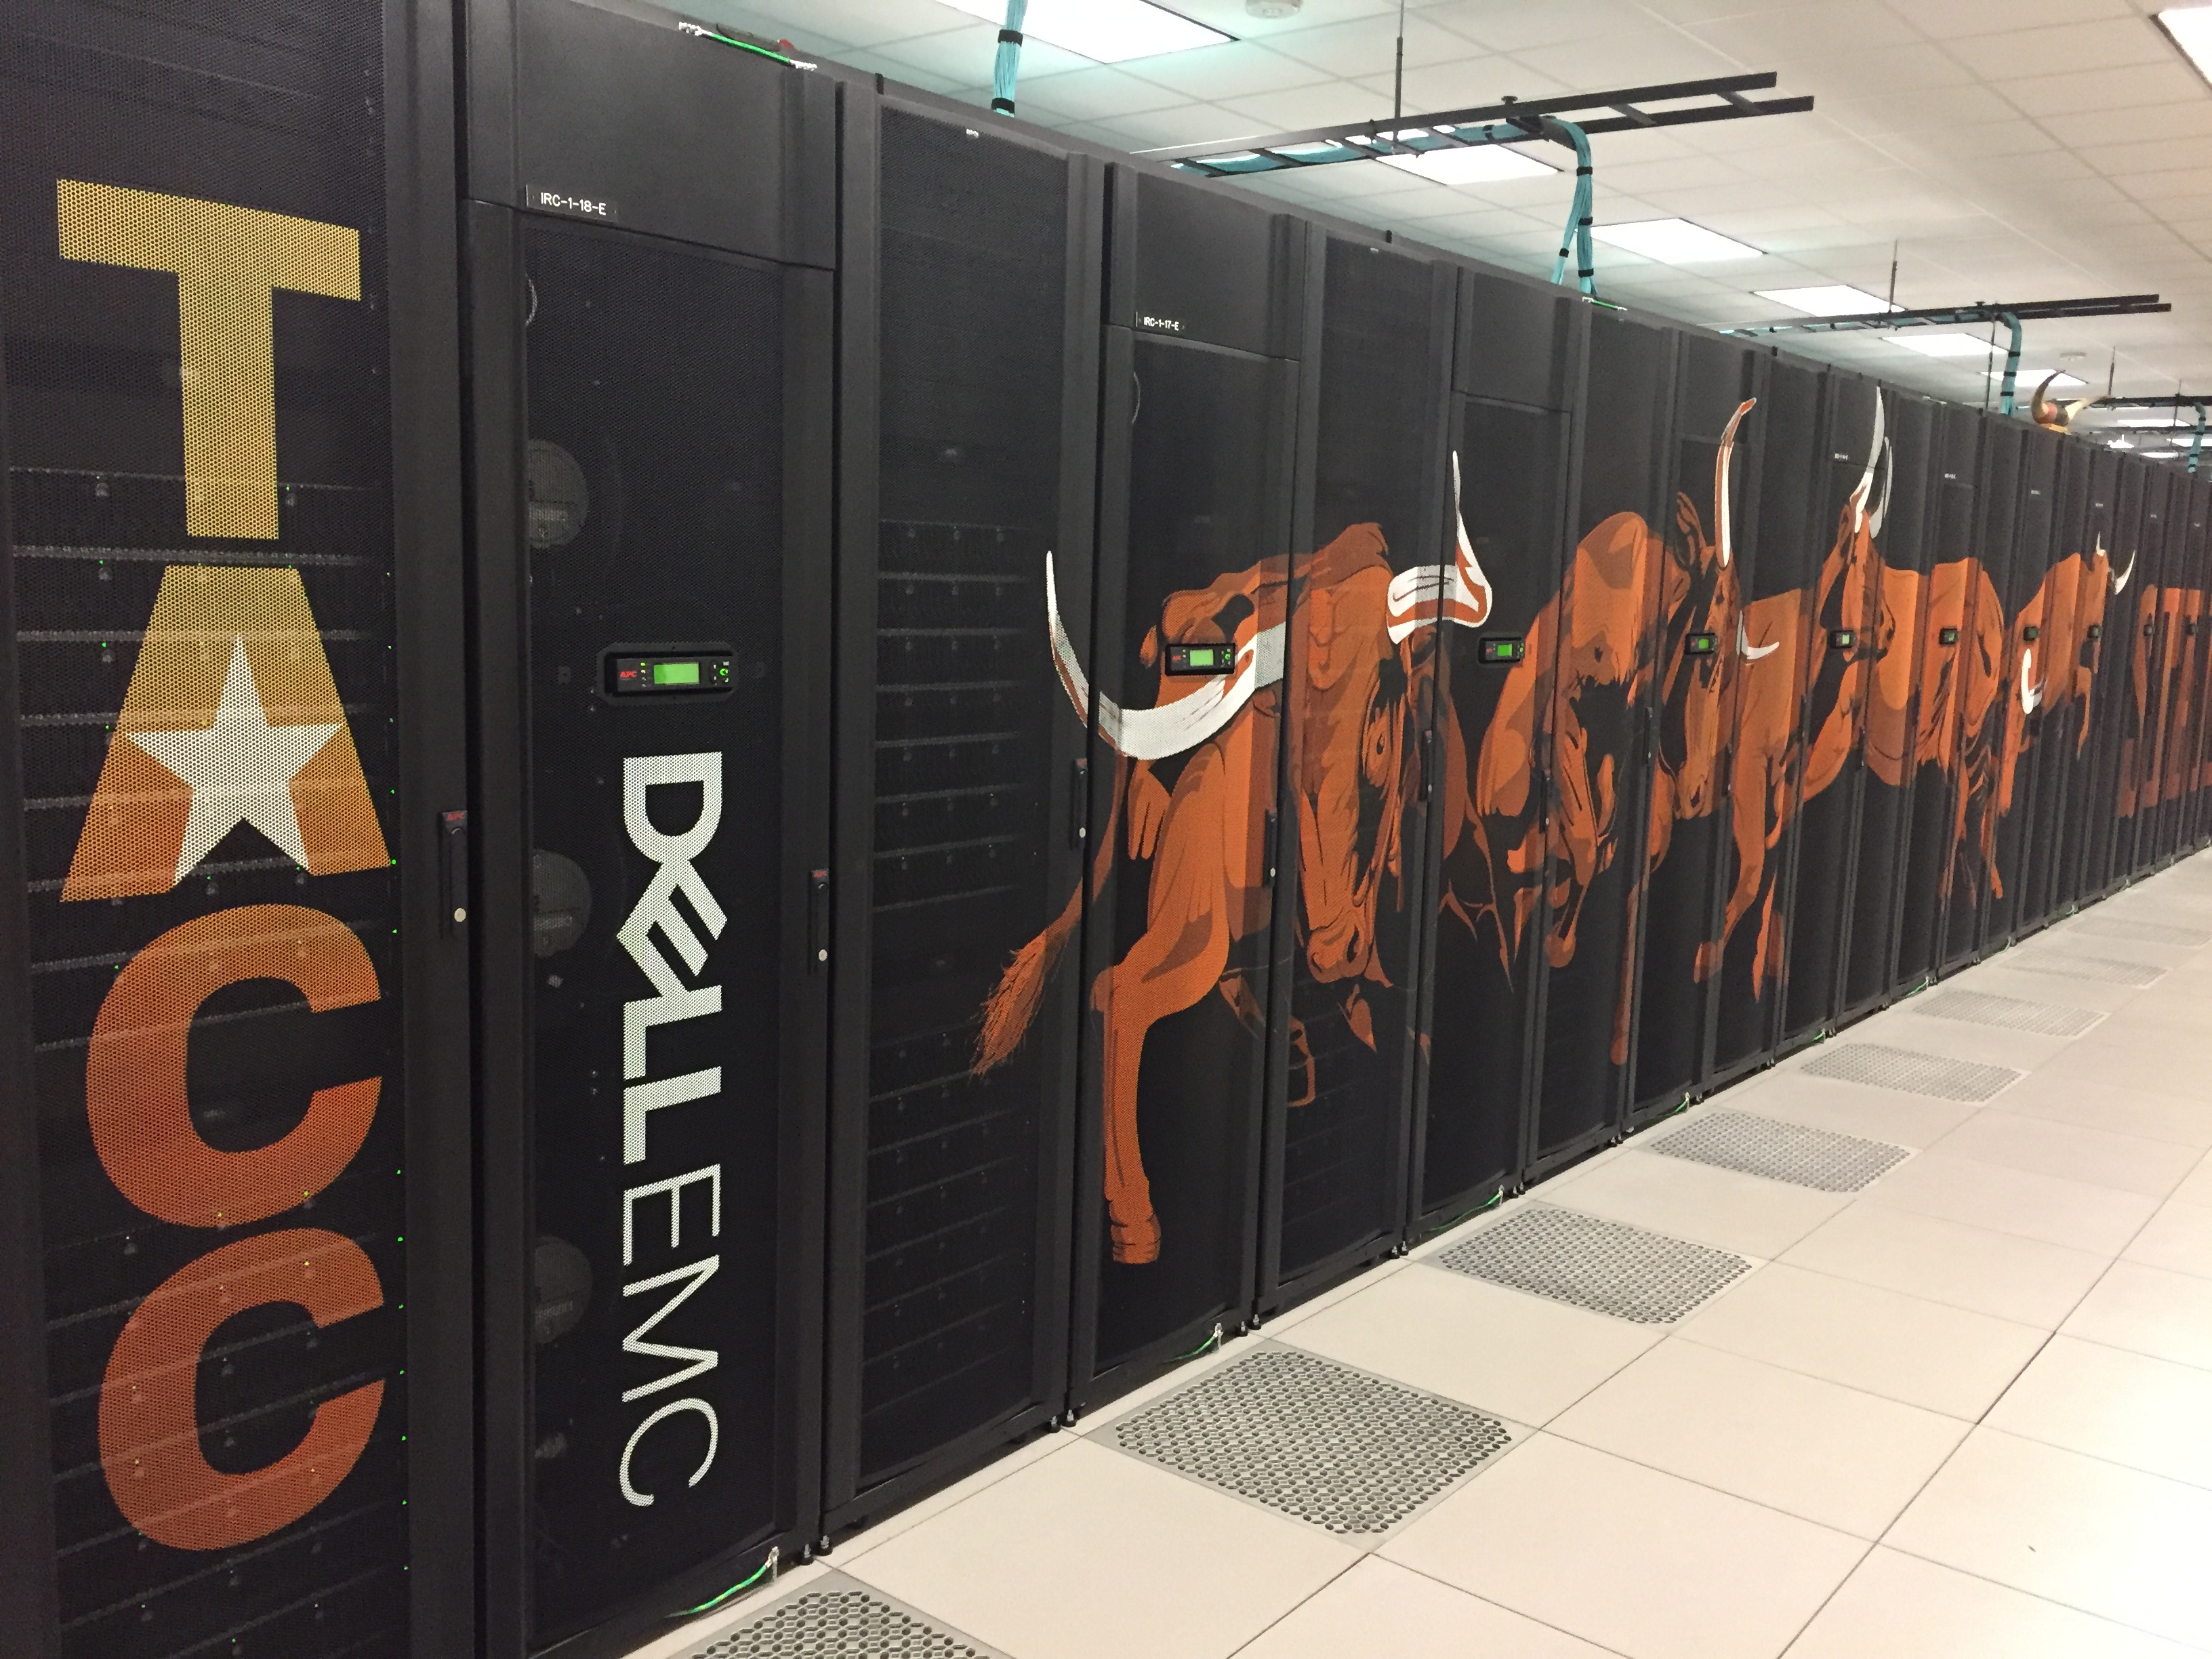 Supercomputers at UT Austin's TACC. Photo: Mackenzie M. Johnson